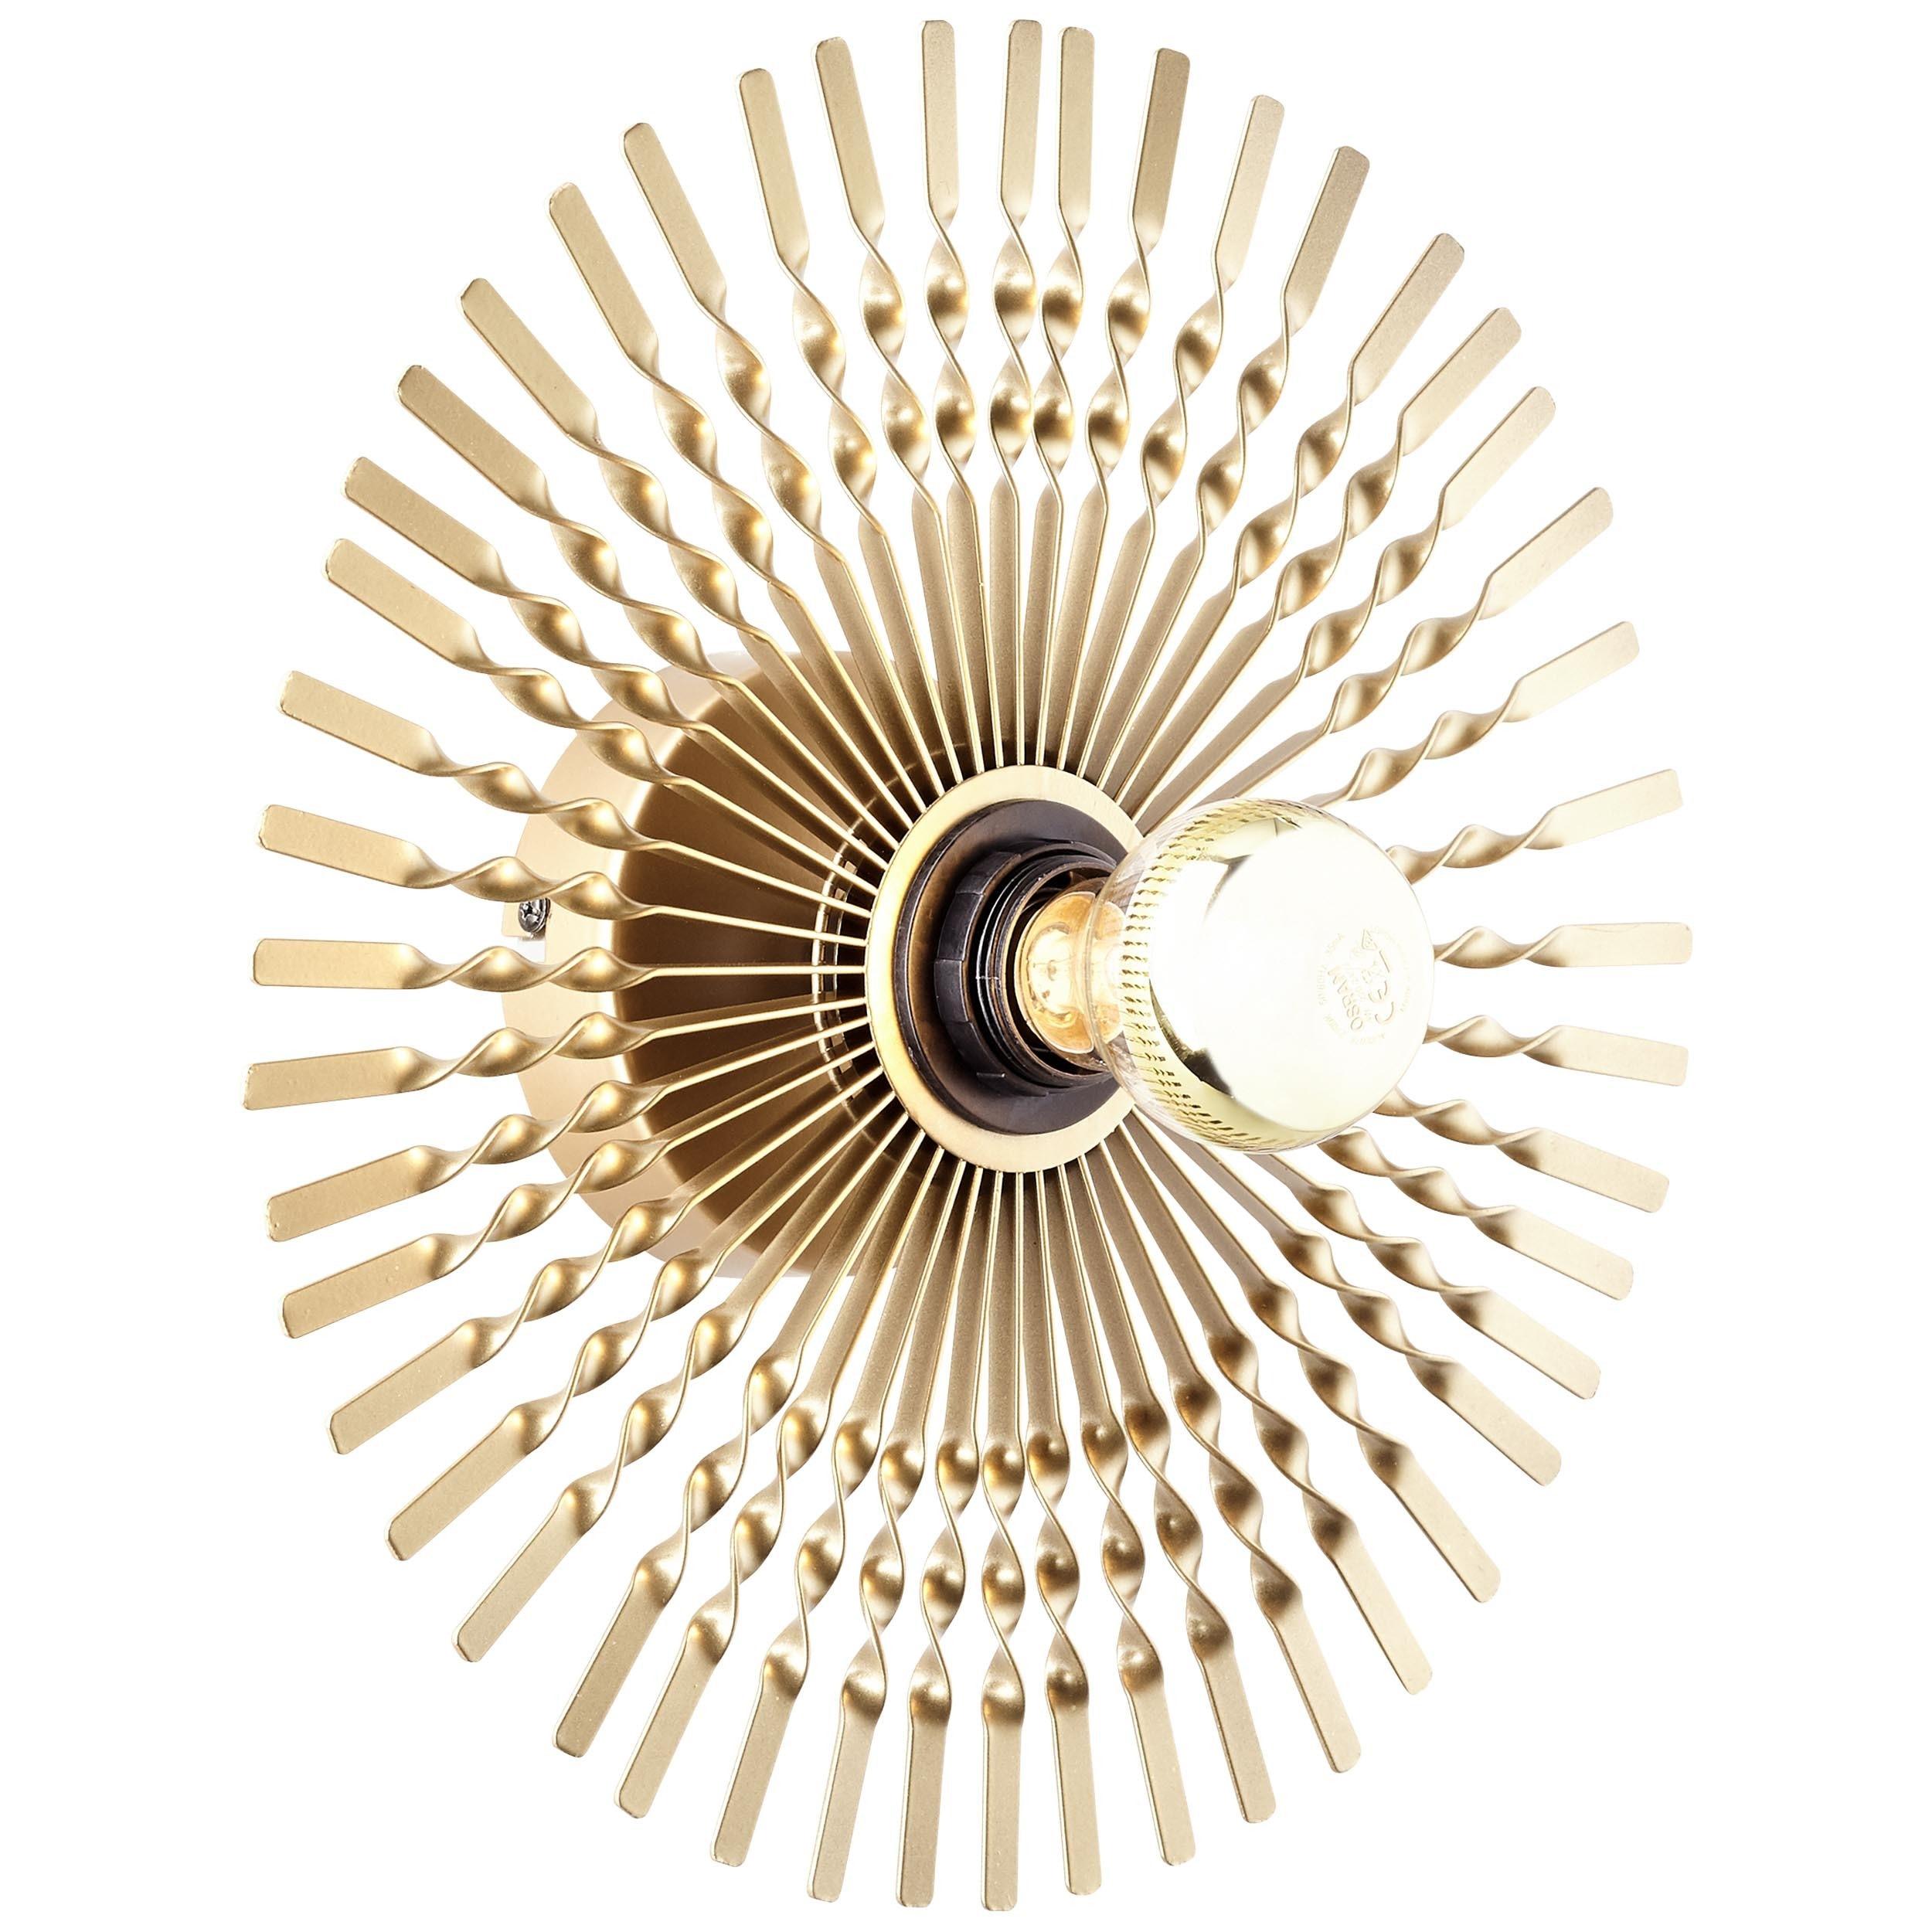 Brilliant Leuchten Wandleuchte, E27, Mendoza Wandleuchte 33cm gold